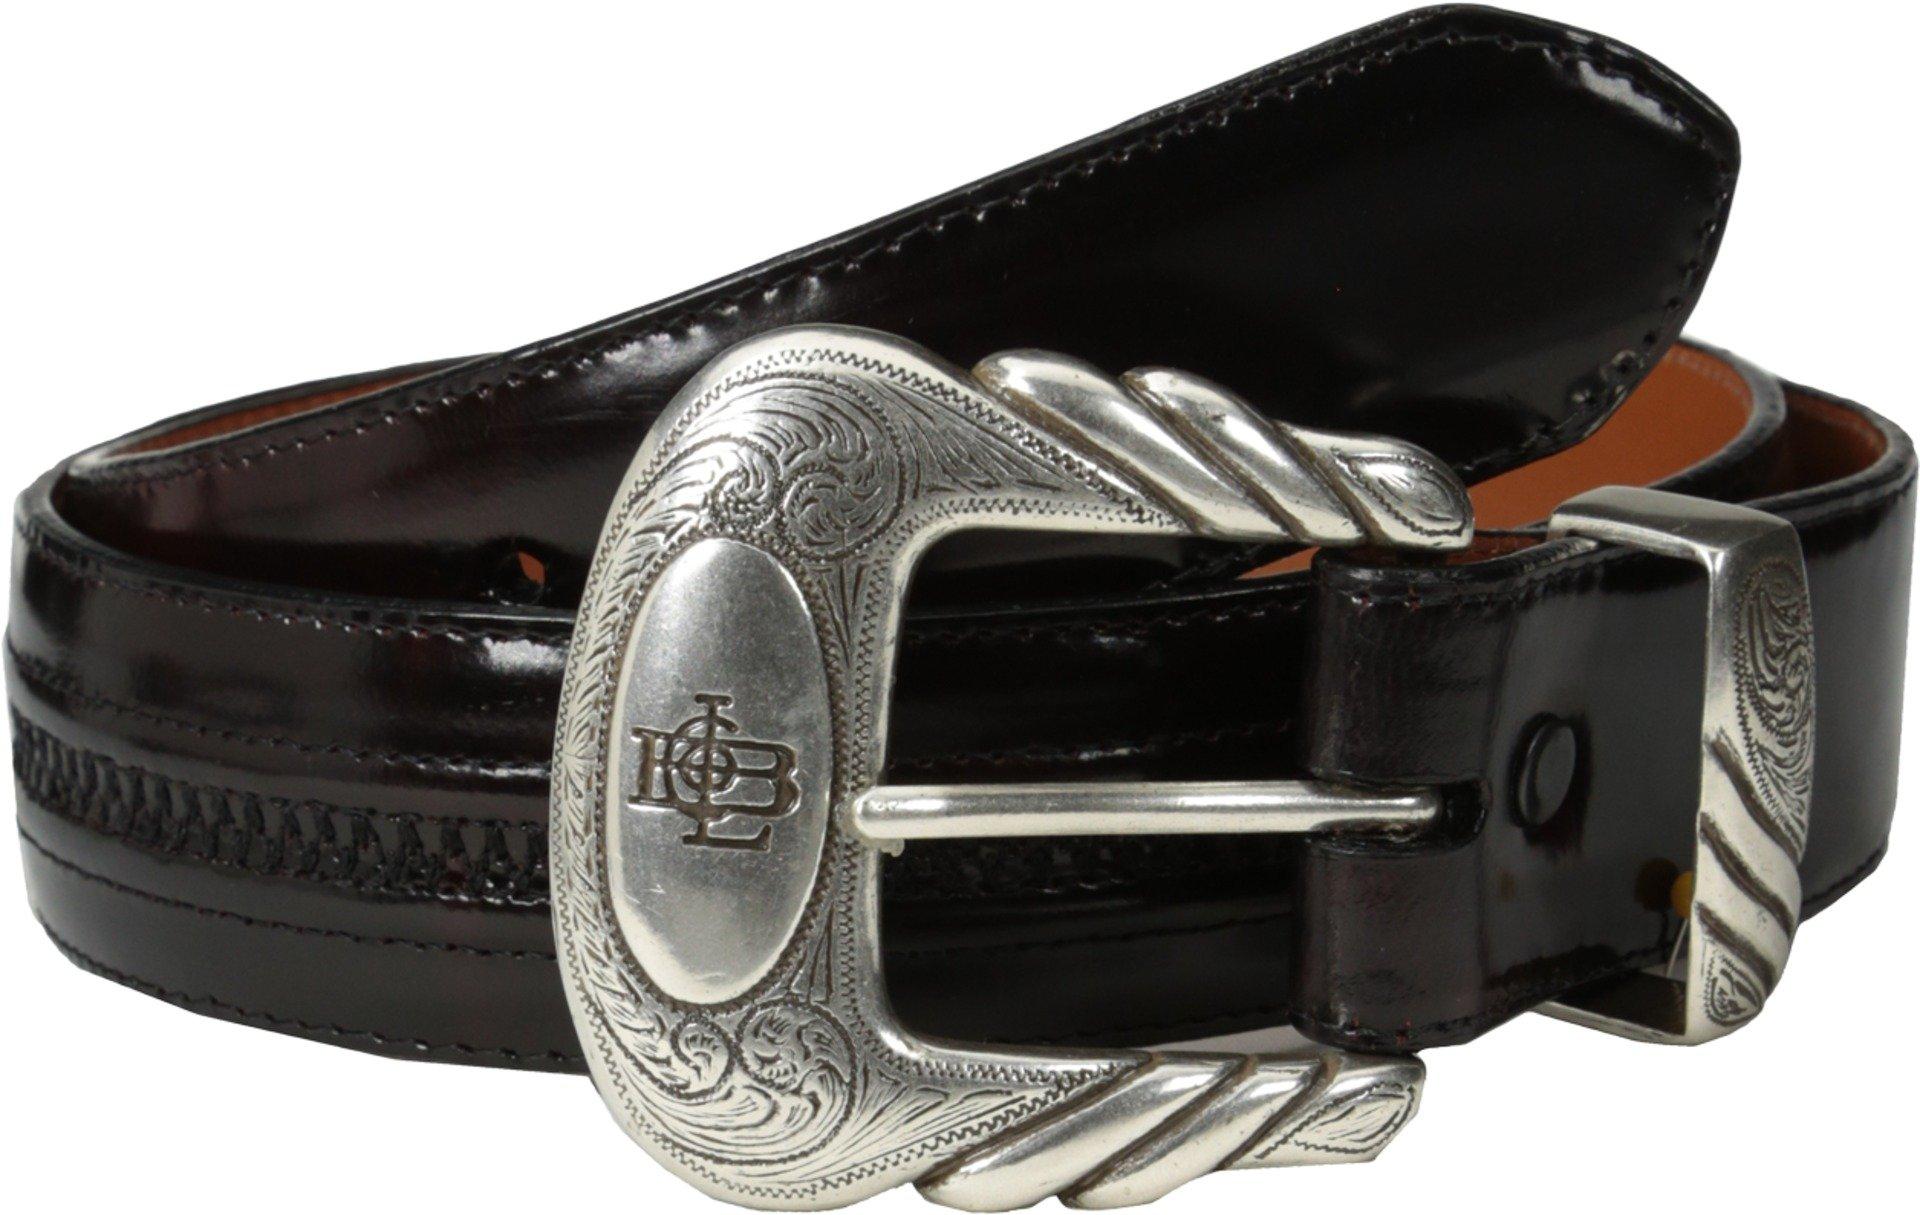 Lucchese Men's Cherry Goatskin Leather Belt Black Cherry 40